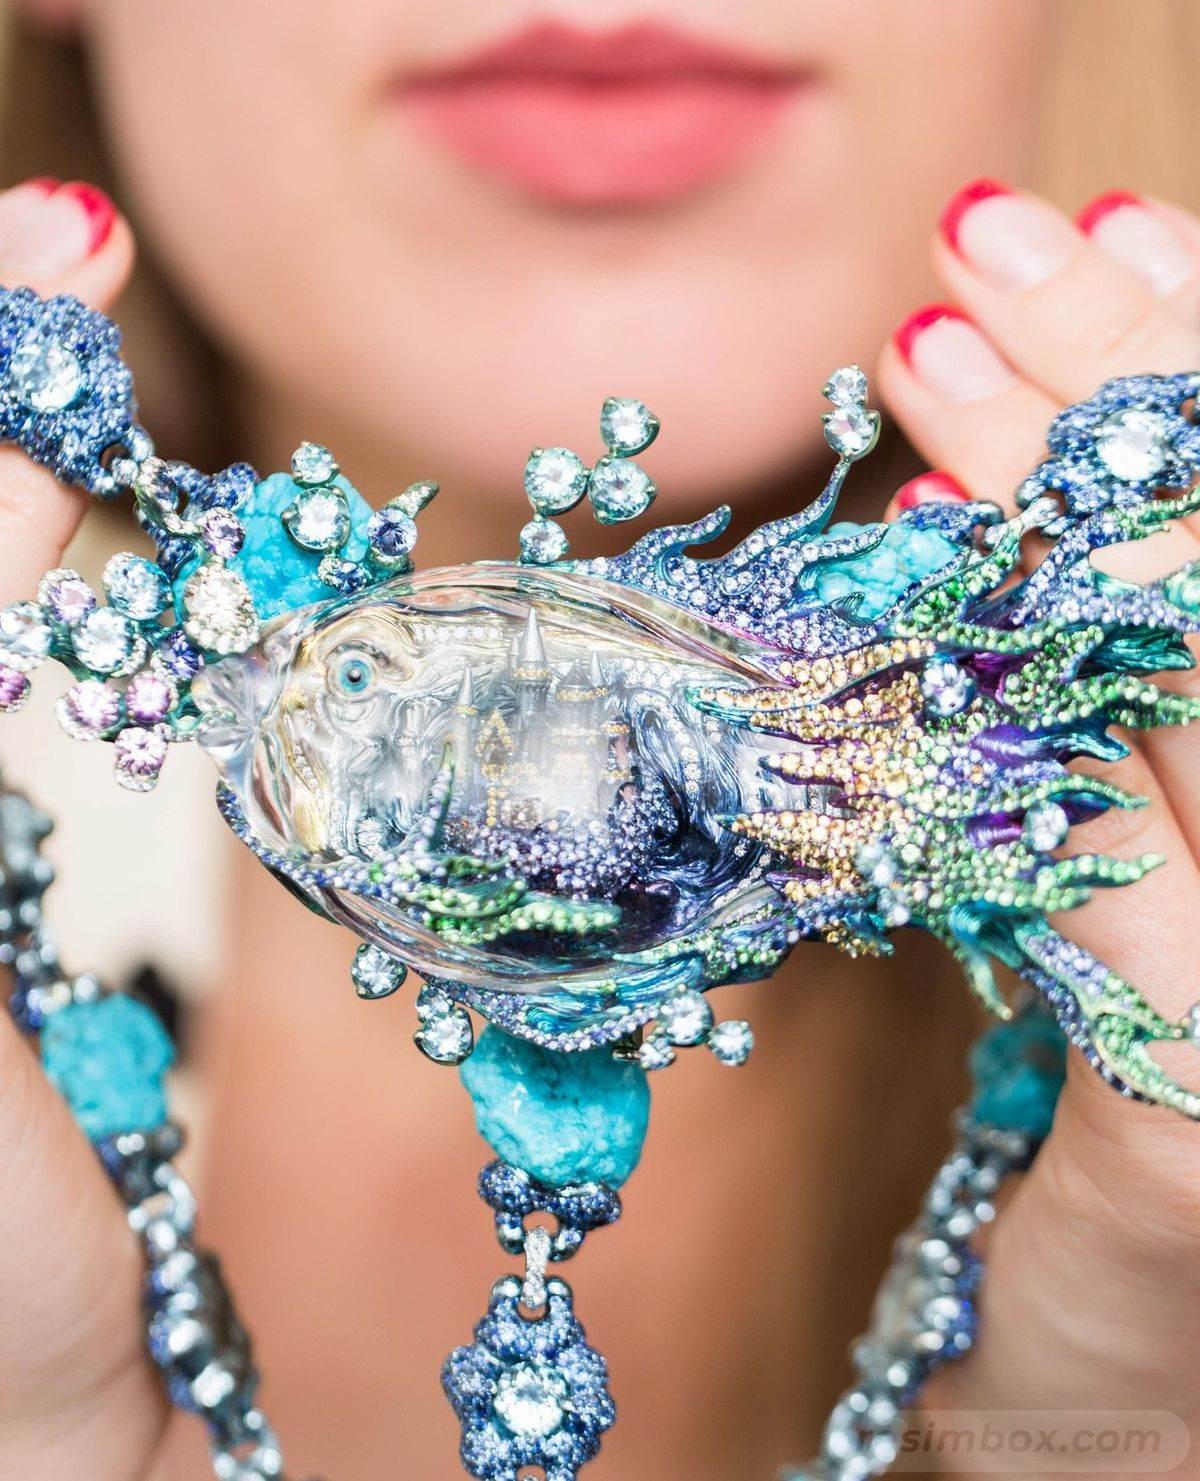 gemologue-animal-jewelry-curation-141652350766279126